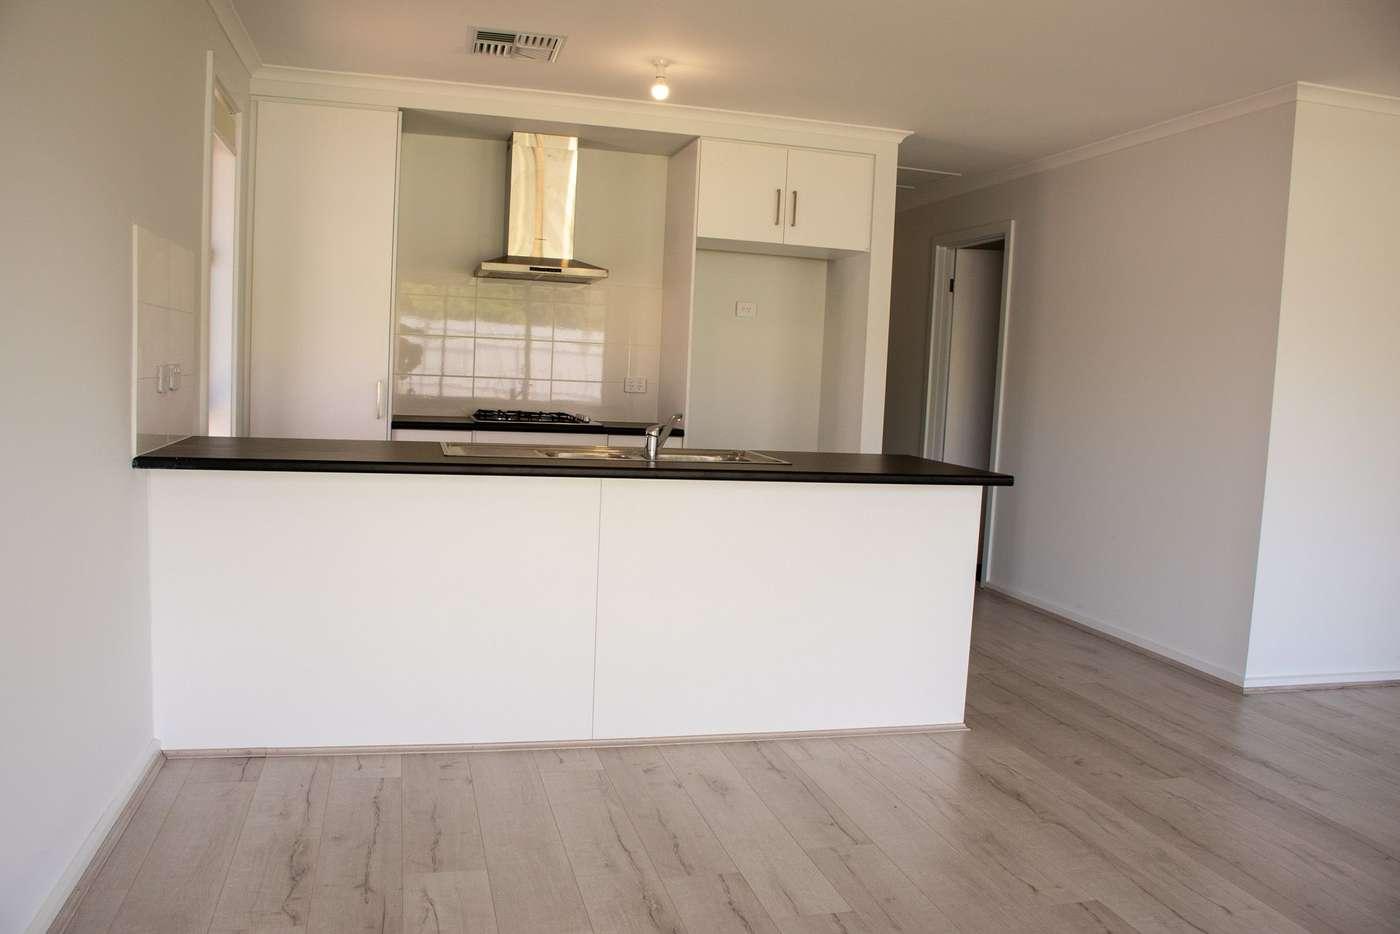 Seventh view of Homely house listing, 21 Wangara Avenue, Morphett Vale SA 5162